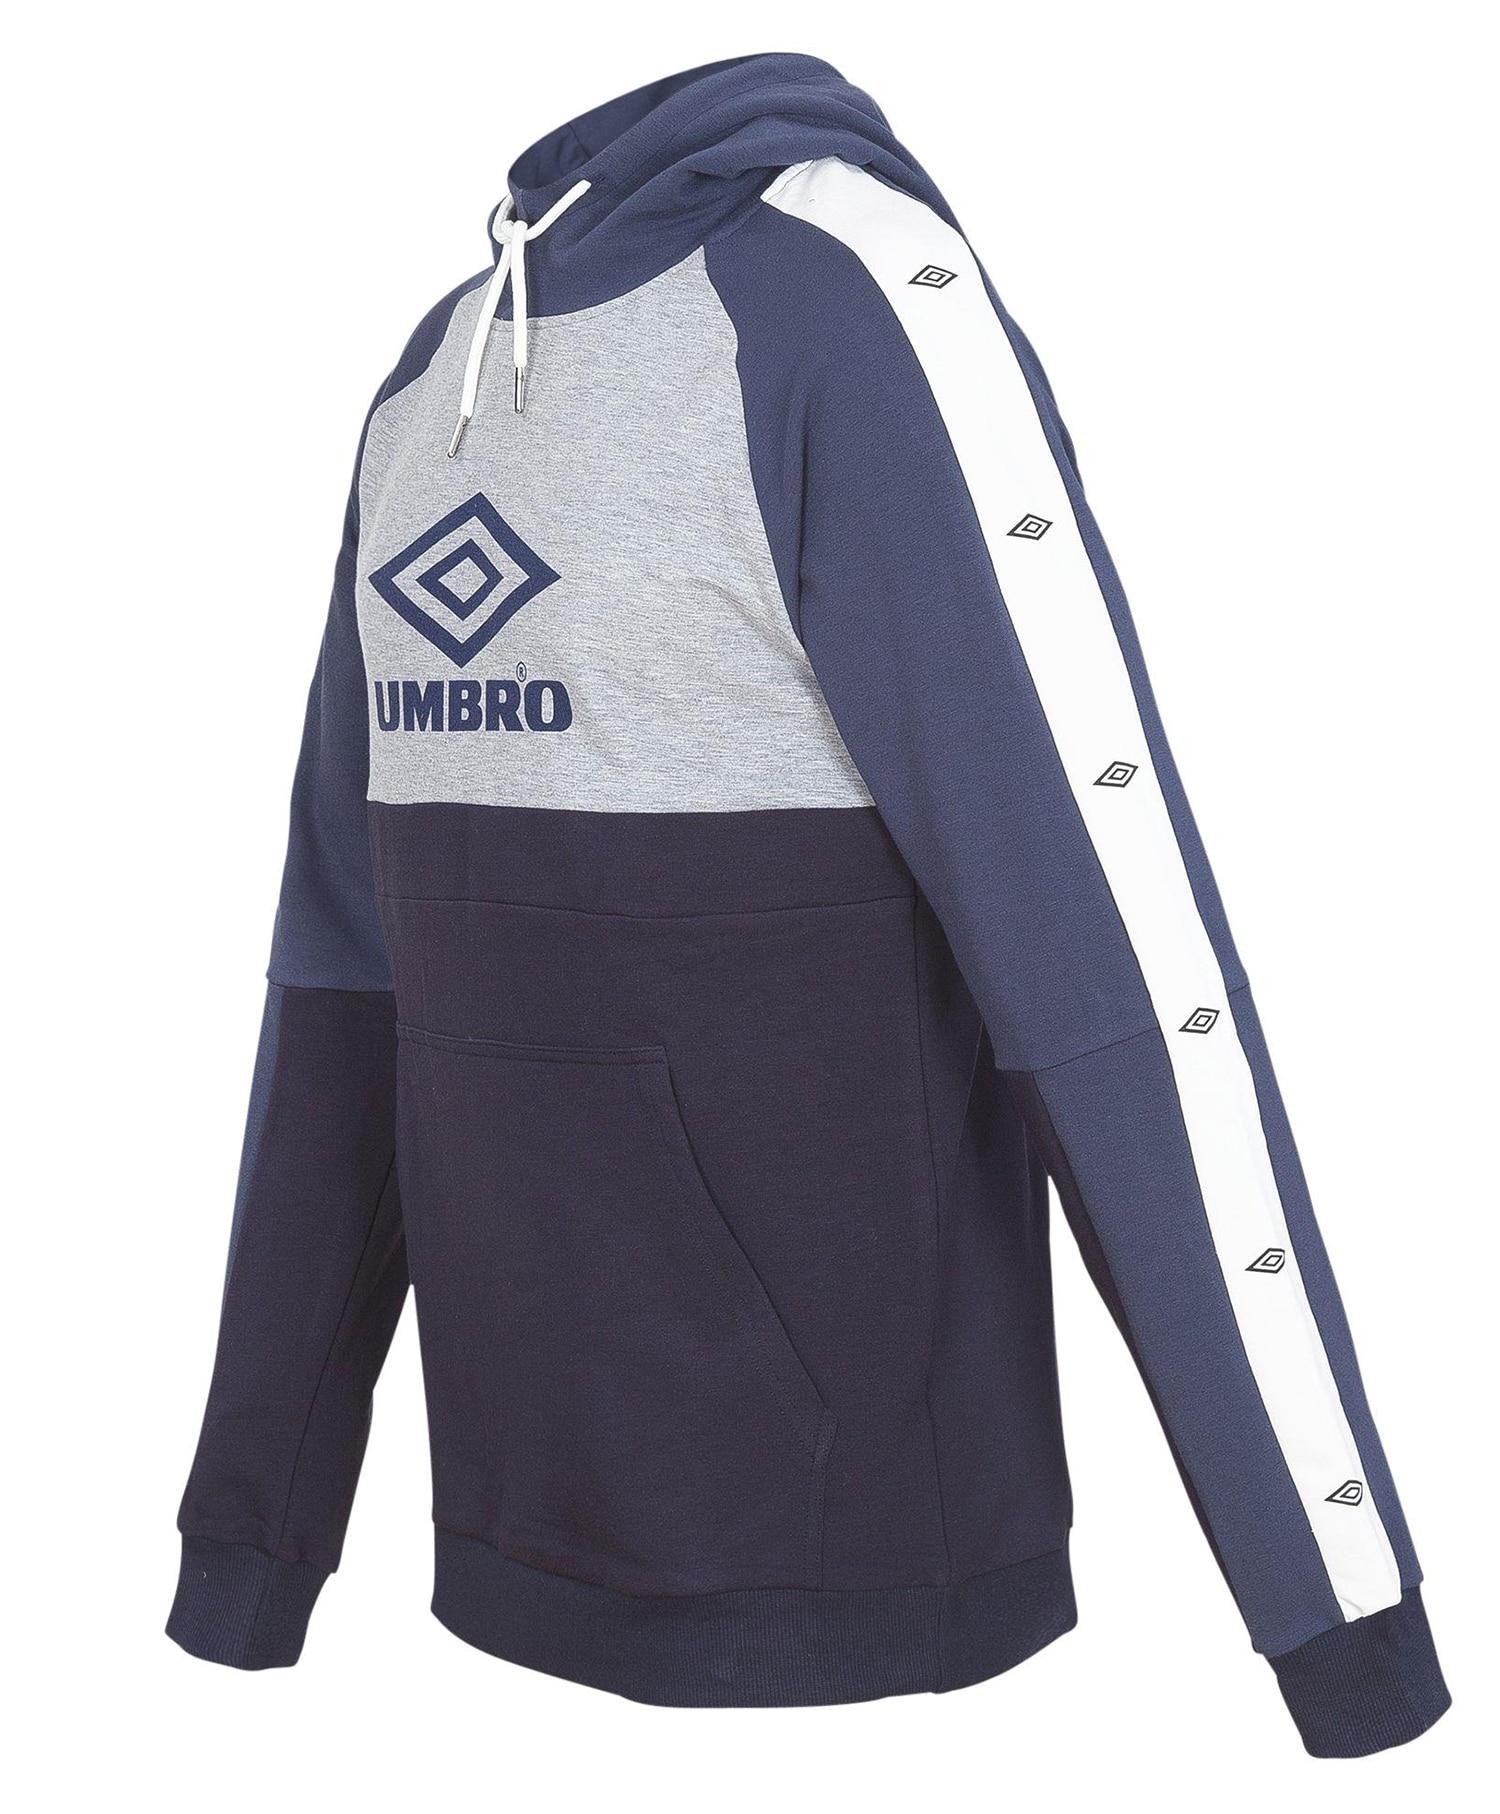 Umbro Core X Hoodie